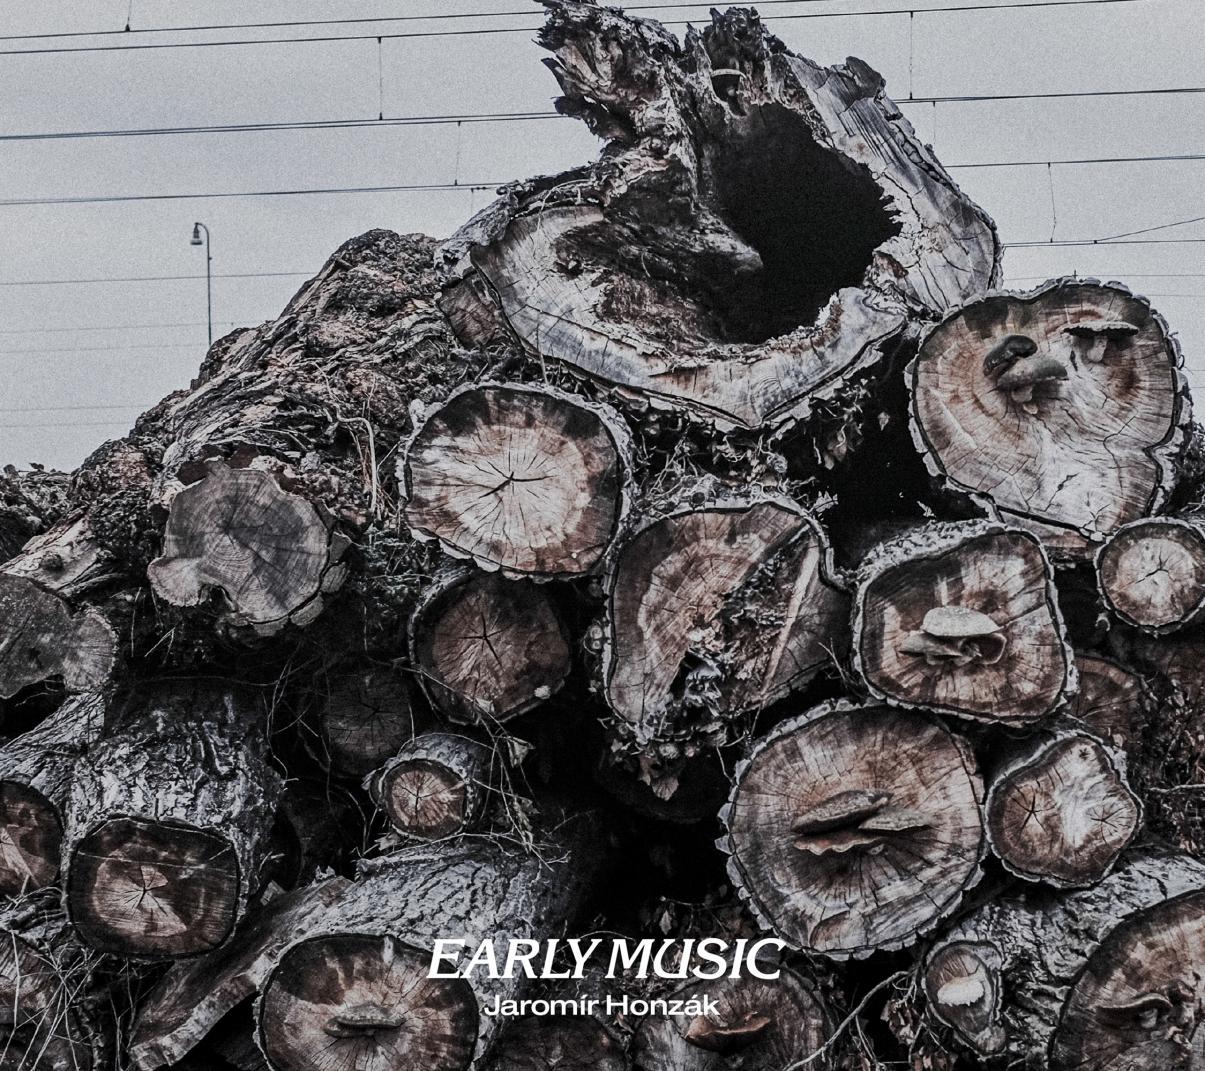 Jaromir Honzak: Early Music【予約受付中】